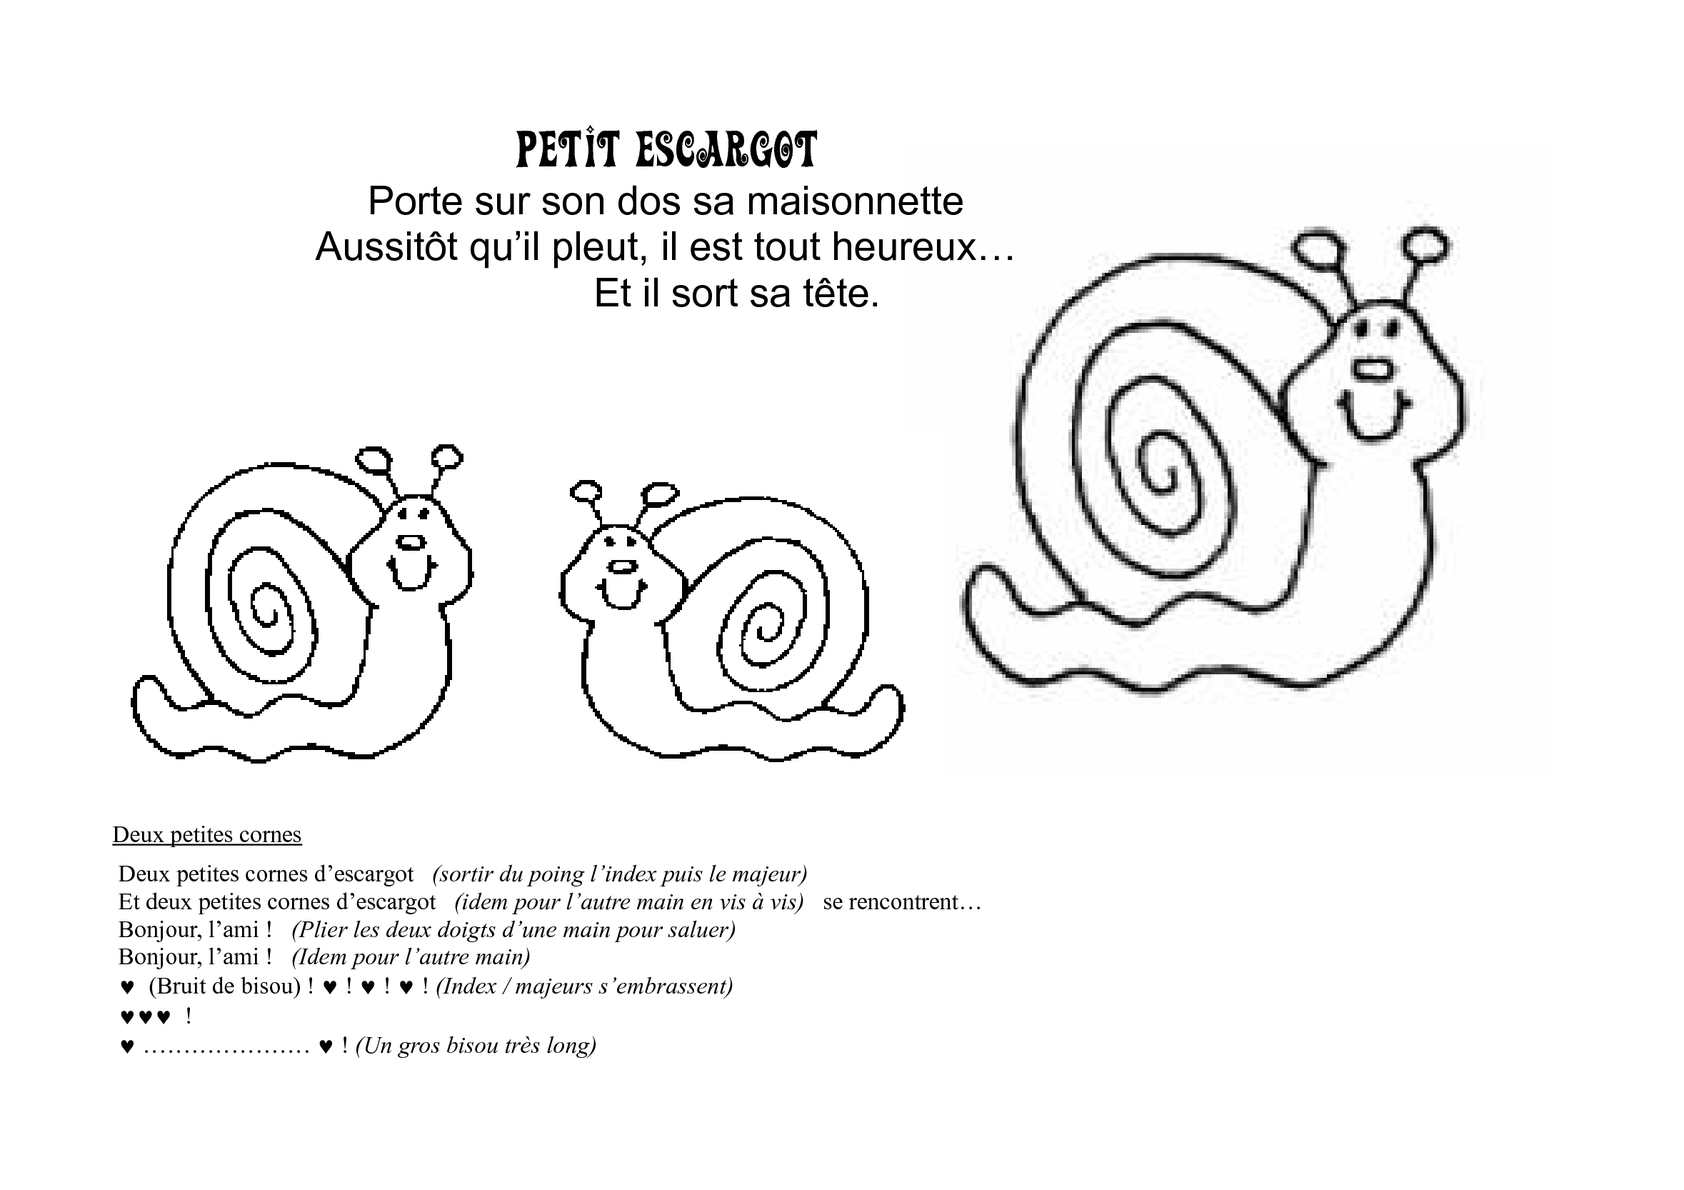 Calam o petit escargot - Parole petit escargot porte sur son dos ...